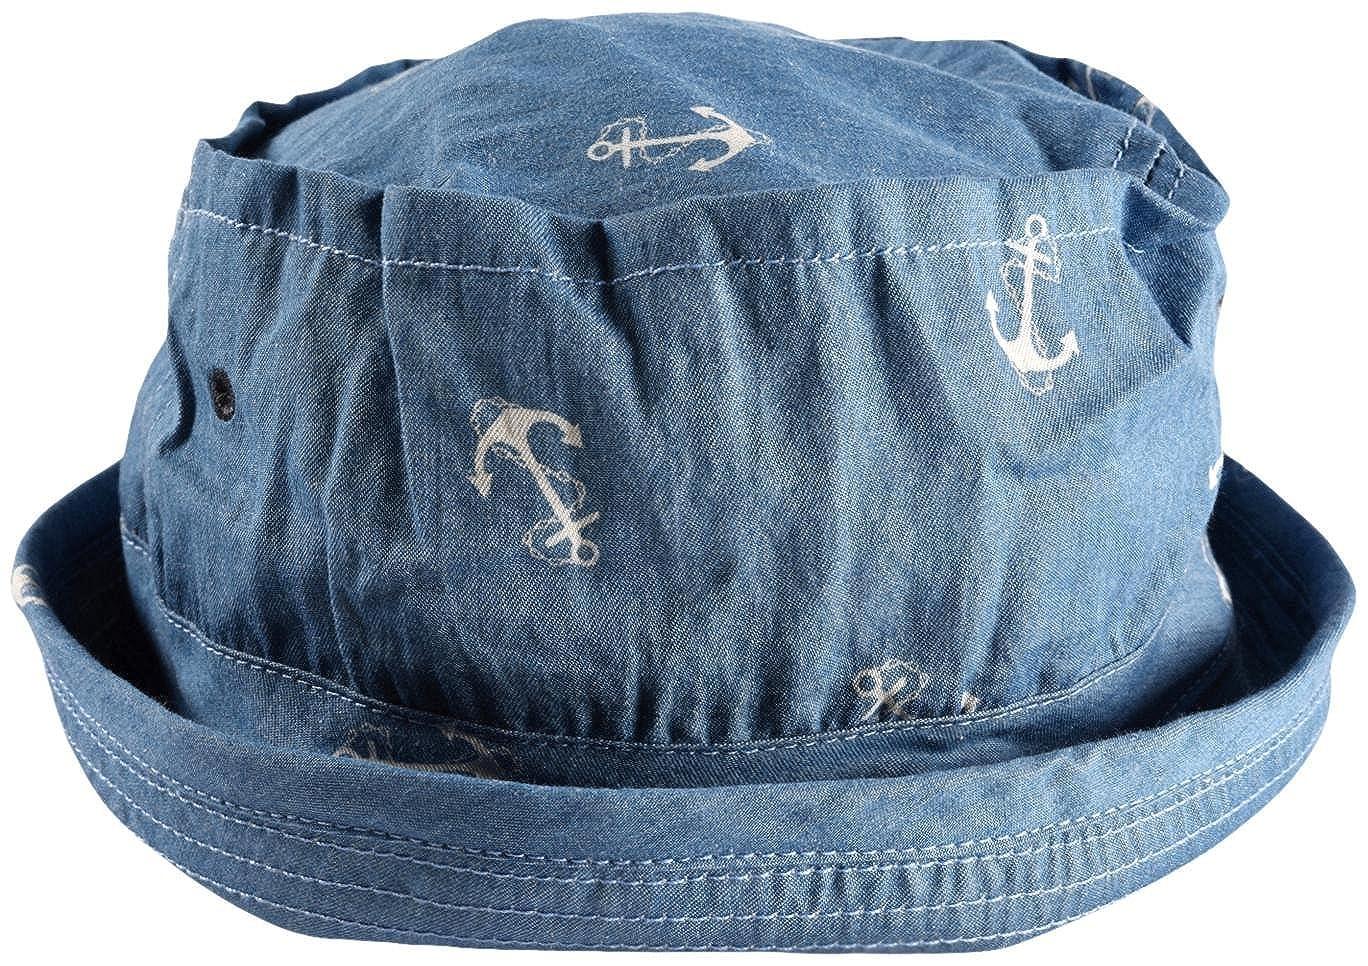 b3ea1125984 Amazon.com  Appaman Boys  Fisherman Hat  Clothing